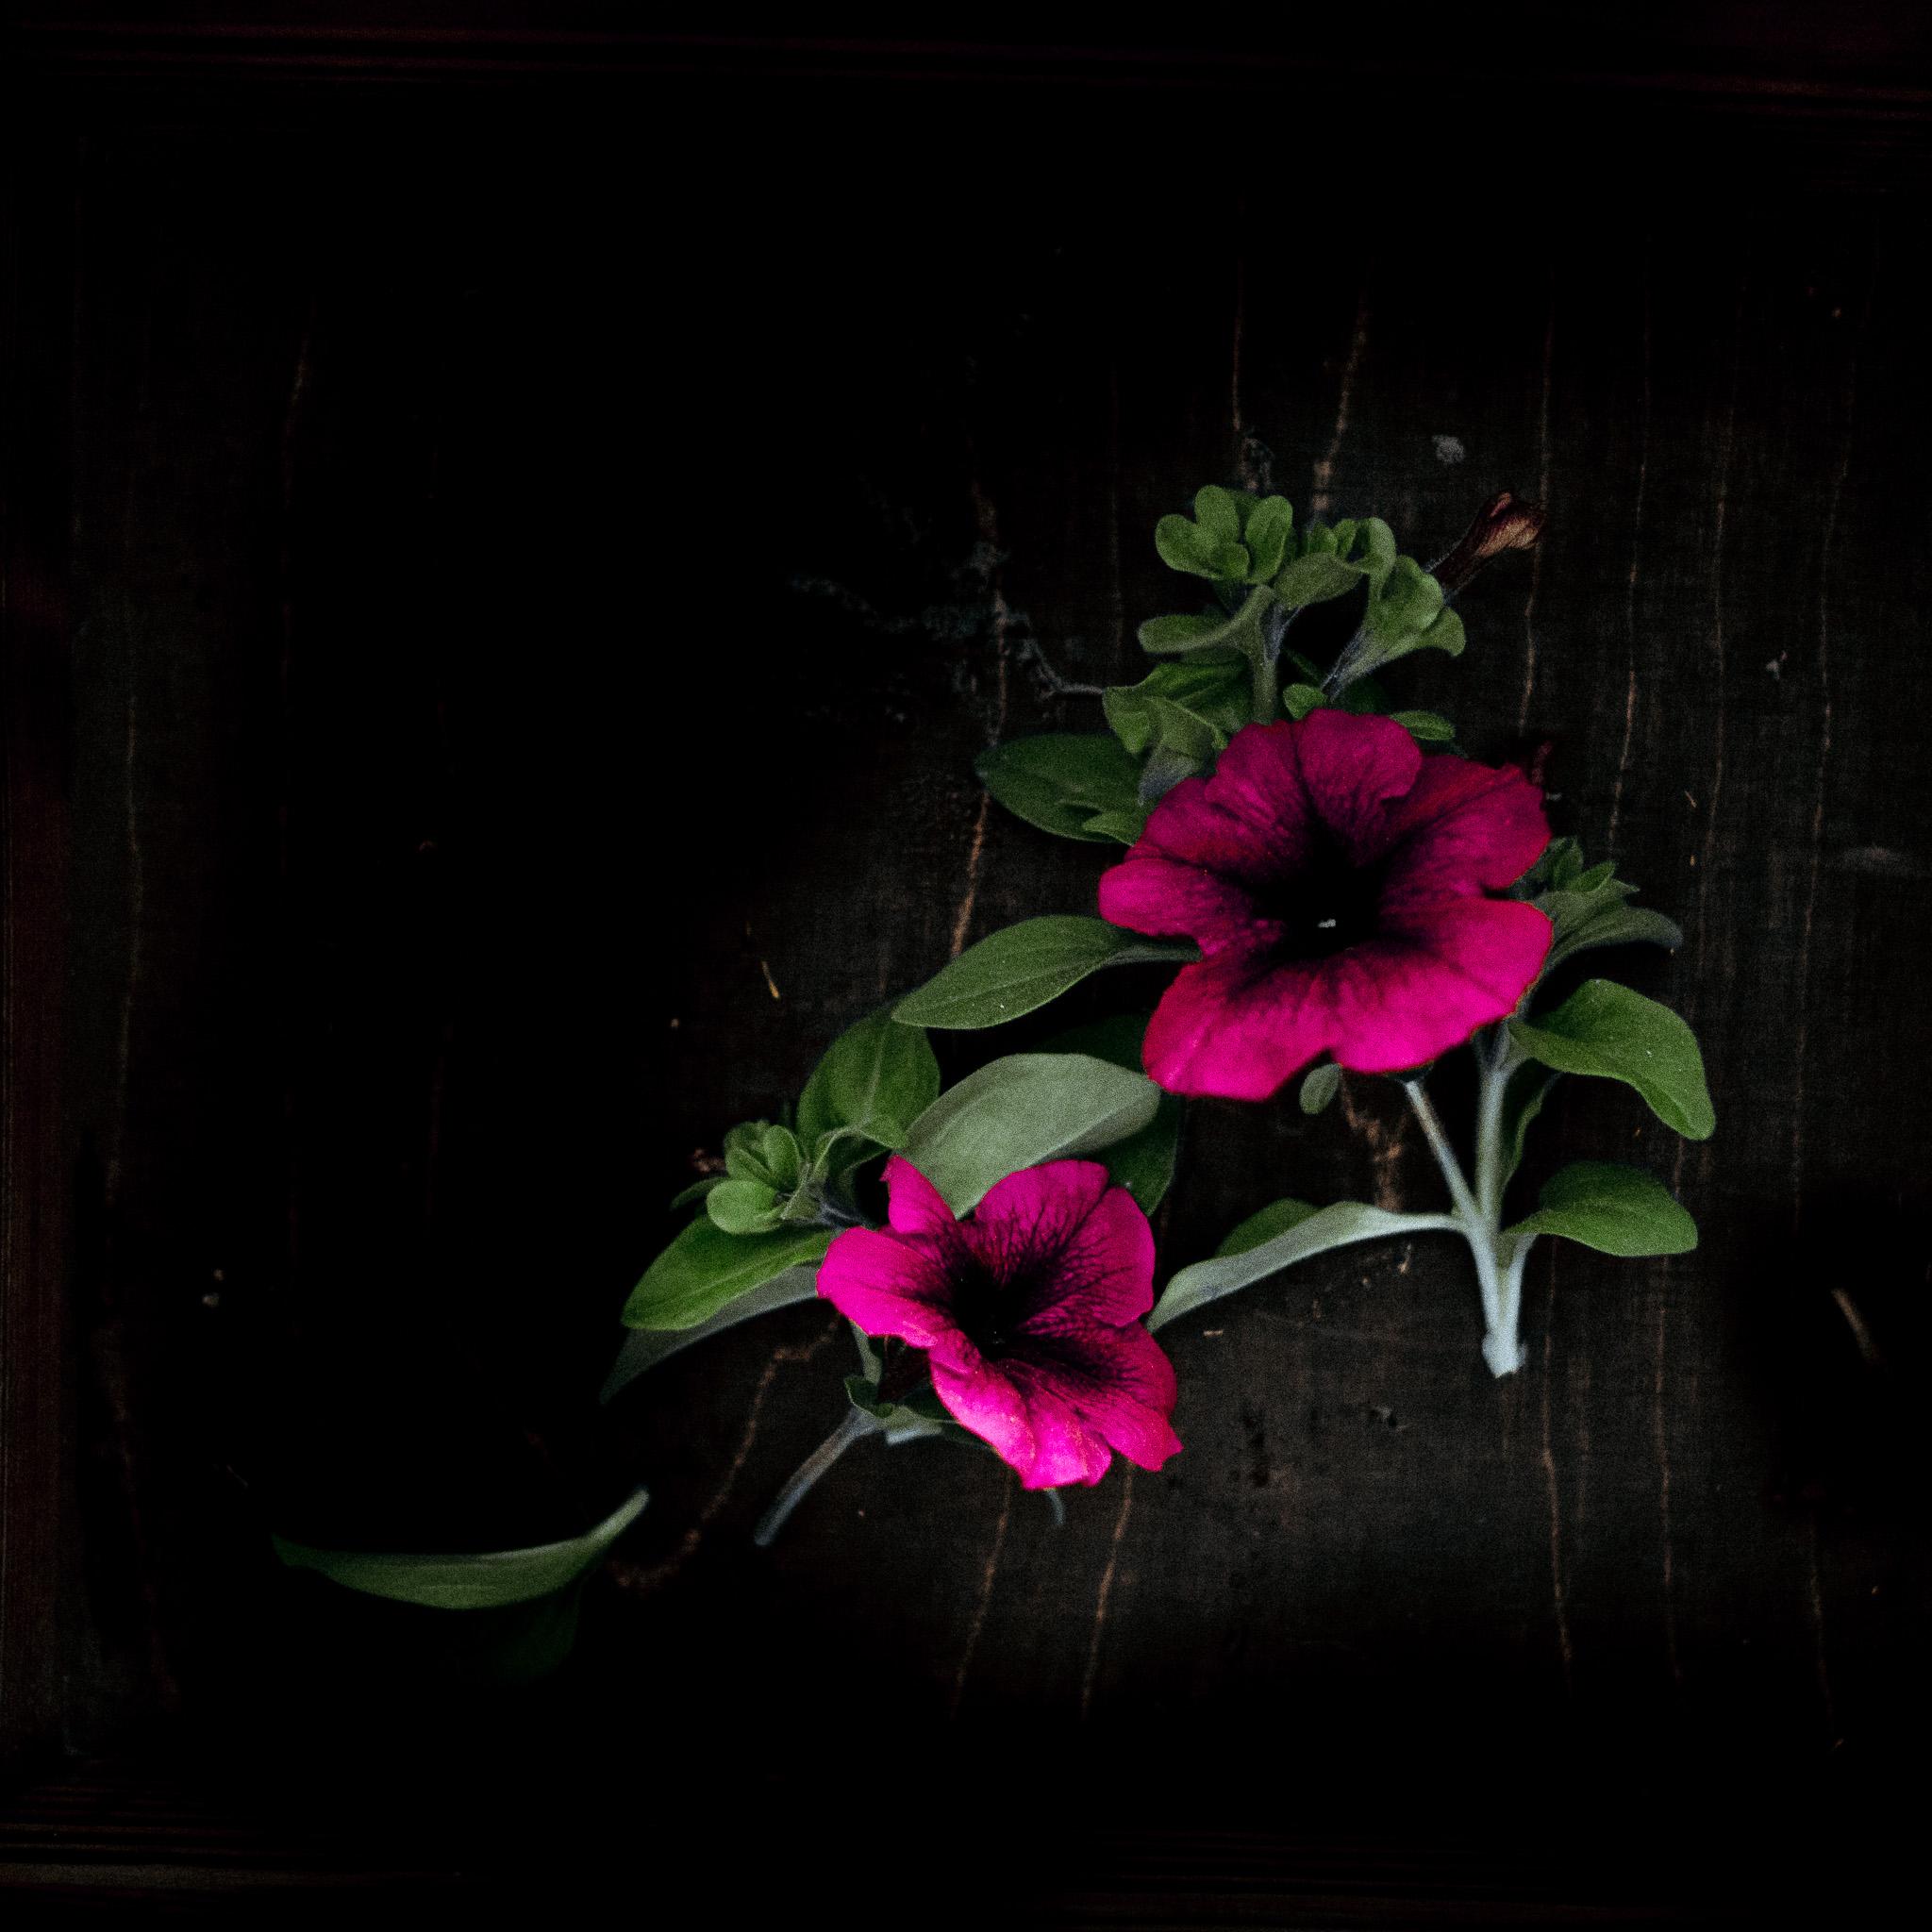 2017-06-11-flower-surprise-window-82_LR edited_web-2.jpg